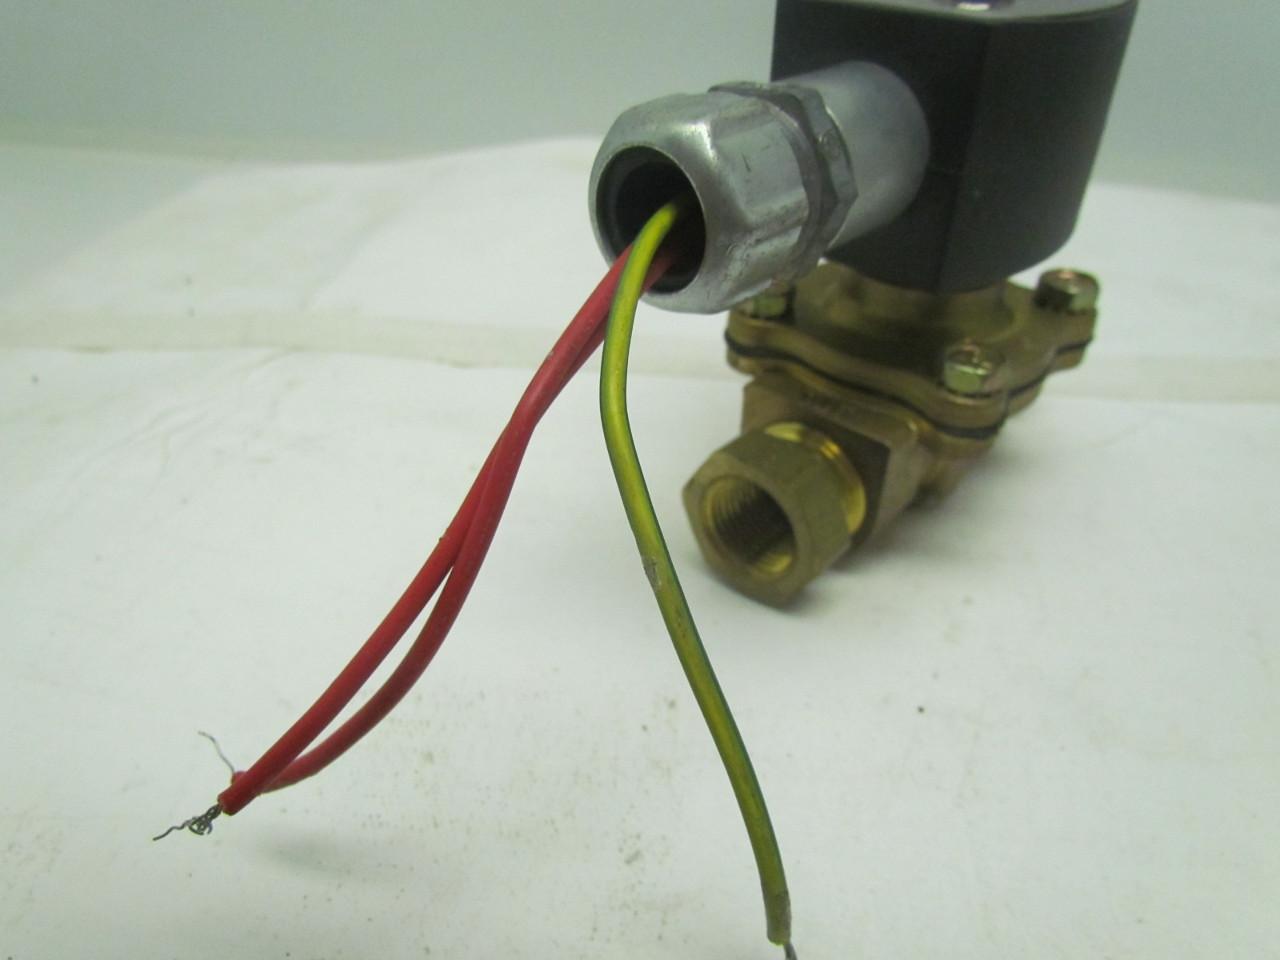 asco solenoid valve 8210 wiring diagram legrand 3 way dimmer switch ef8210g95 shutoff 4 quot npt 120v coil